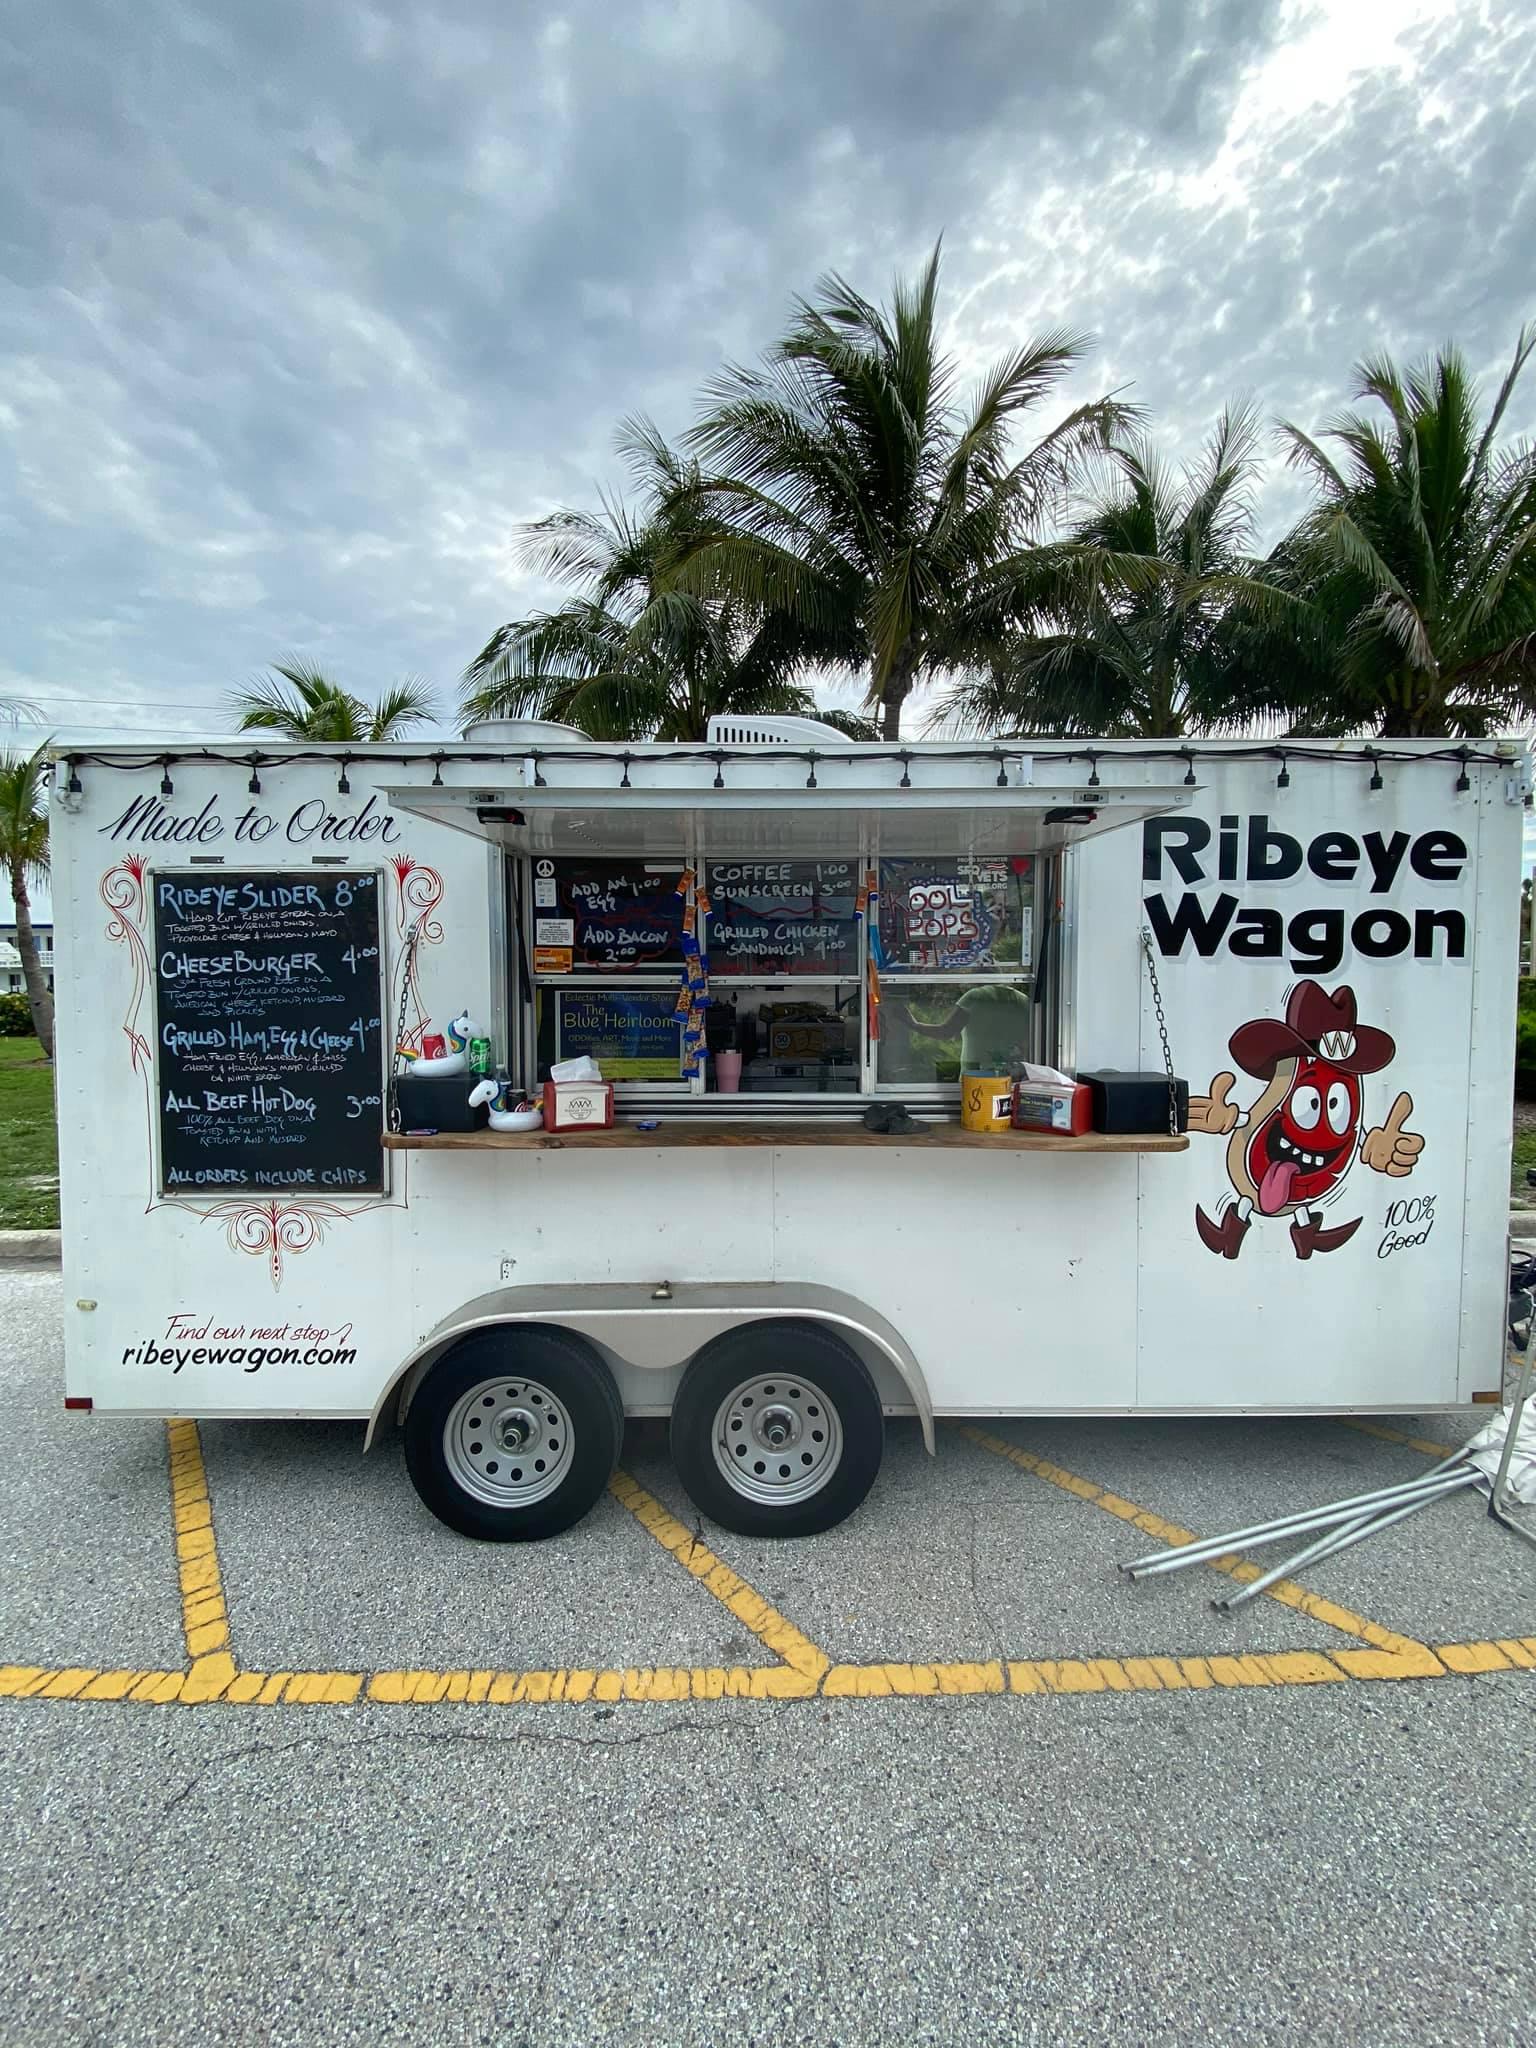 Double W Ribeye Wagon Food Truck